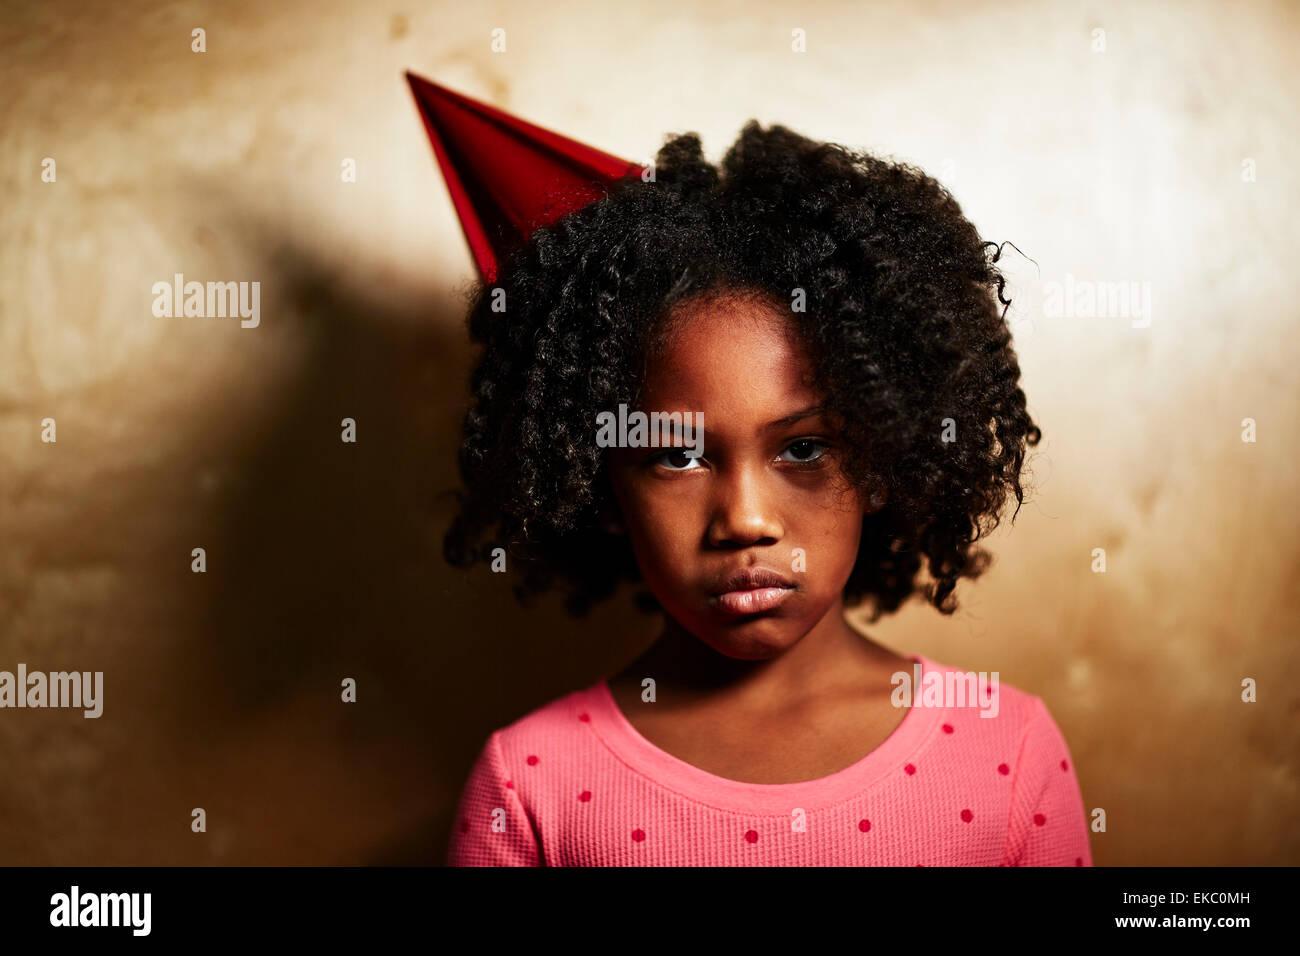 Sad girl wearing party hat - Stock Image